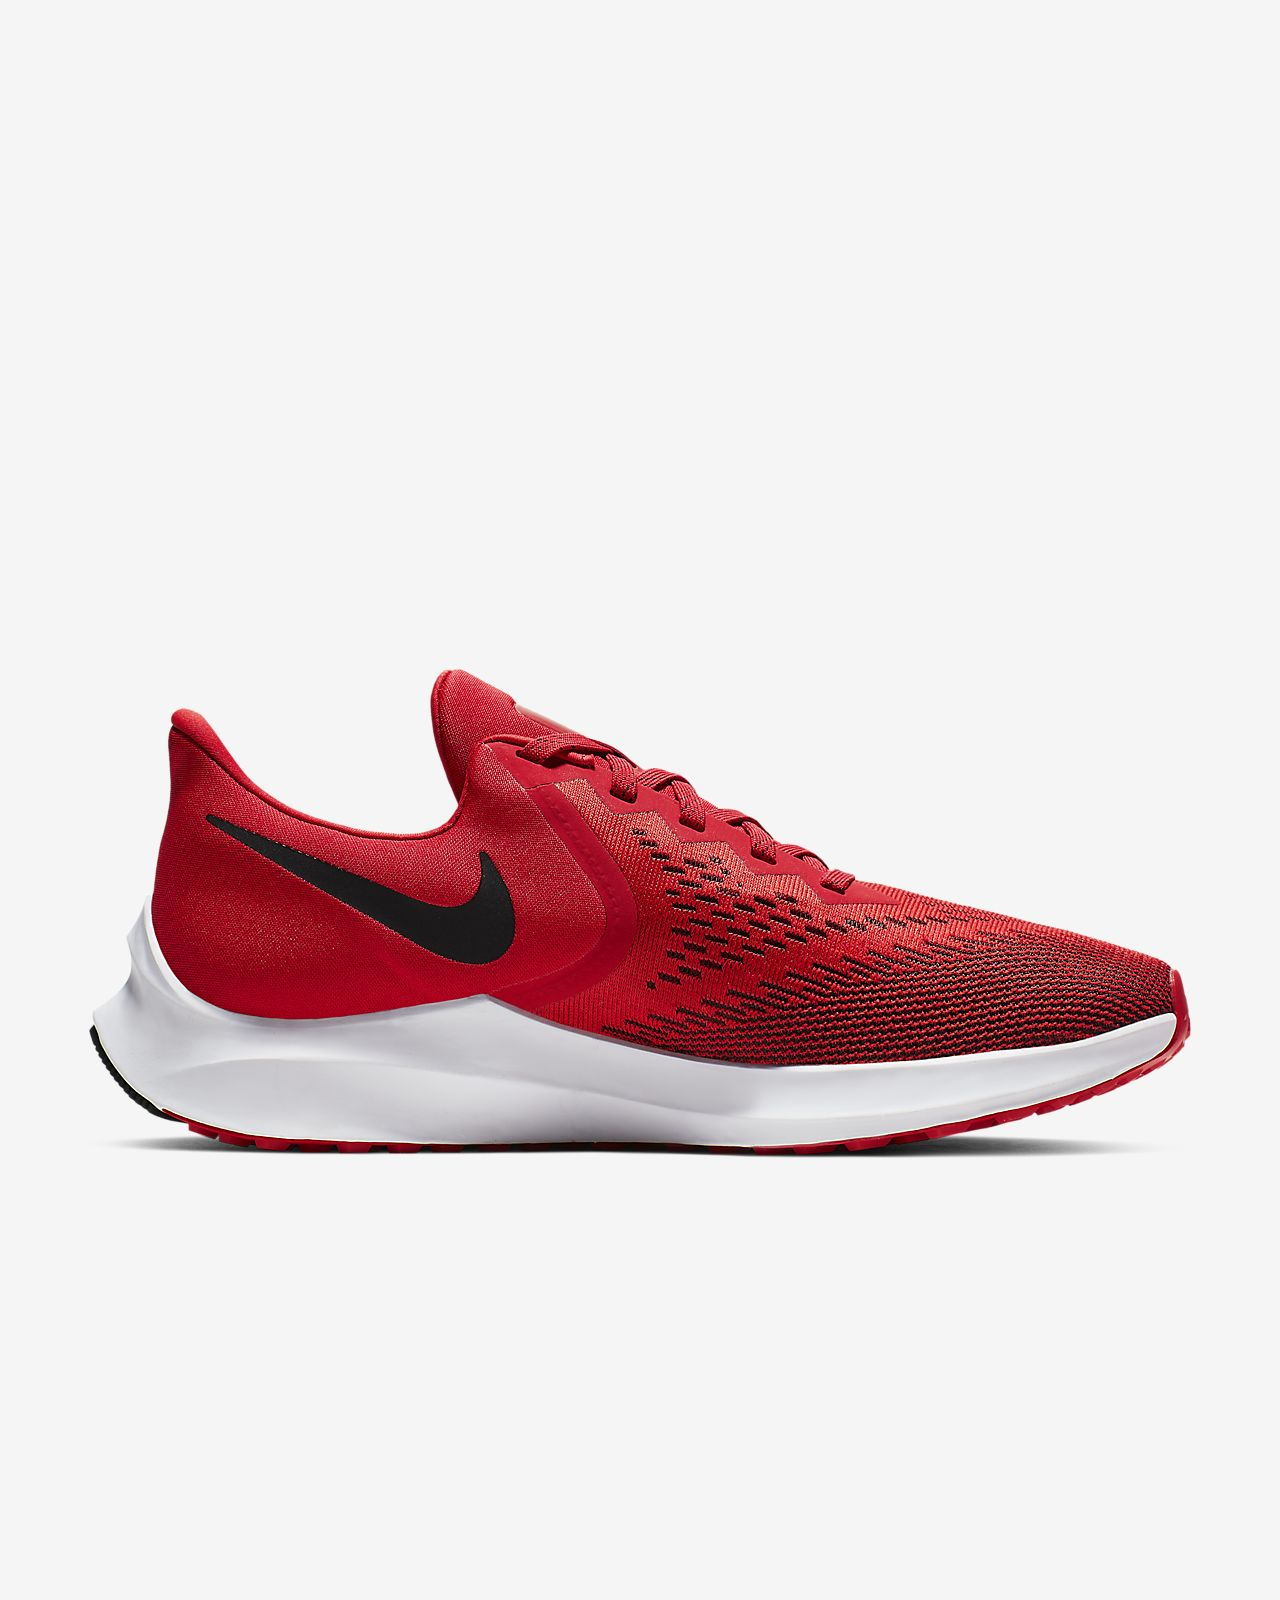 2d7824165024 Nike Air Zoom Winflo 6 Men s Running Shoe. Nike.com